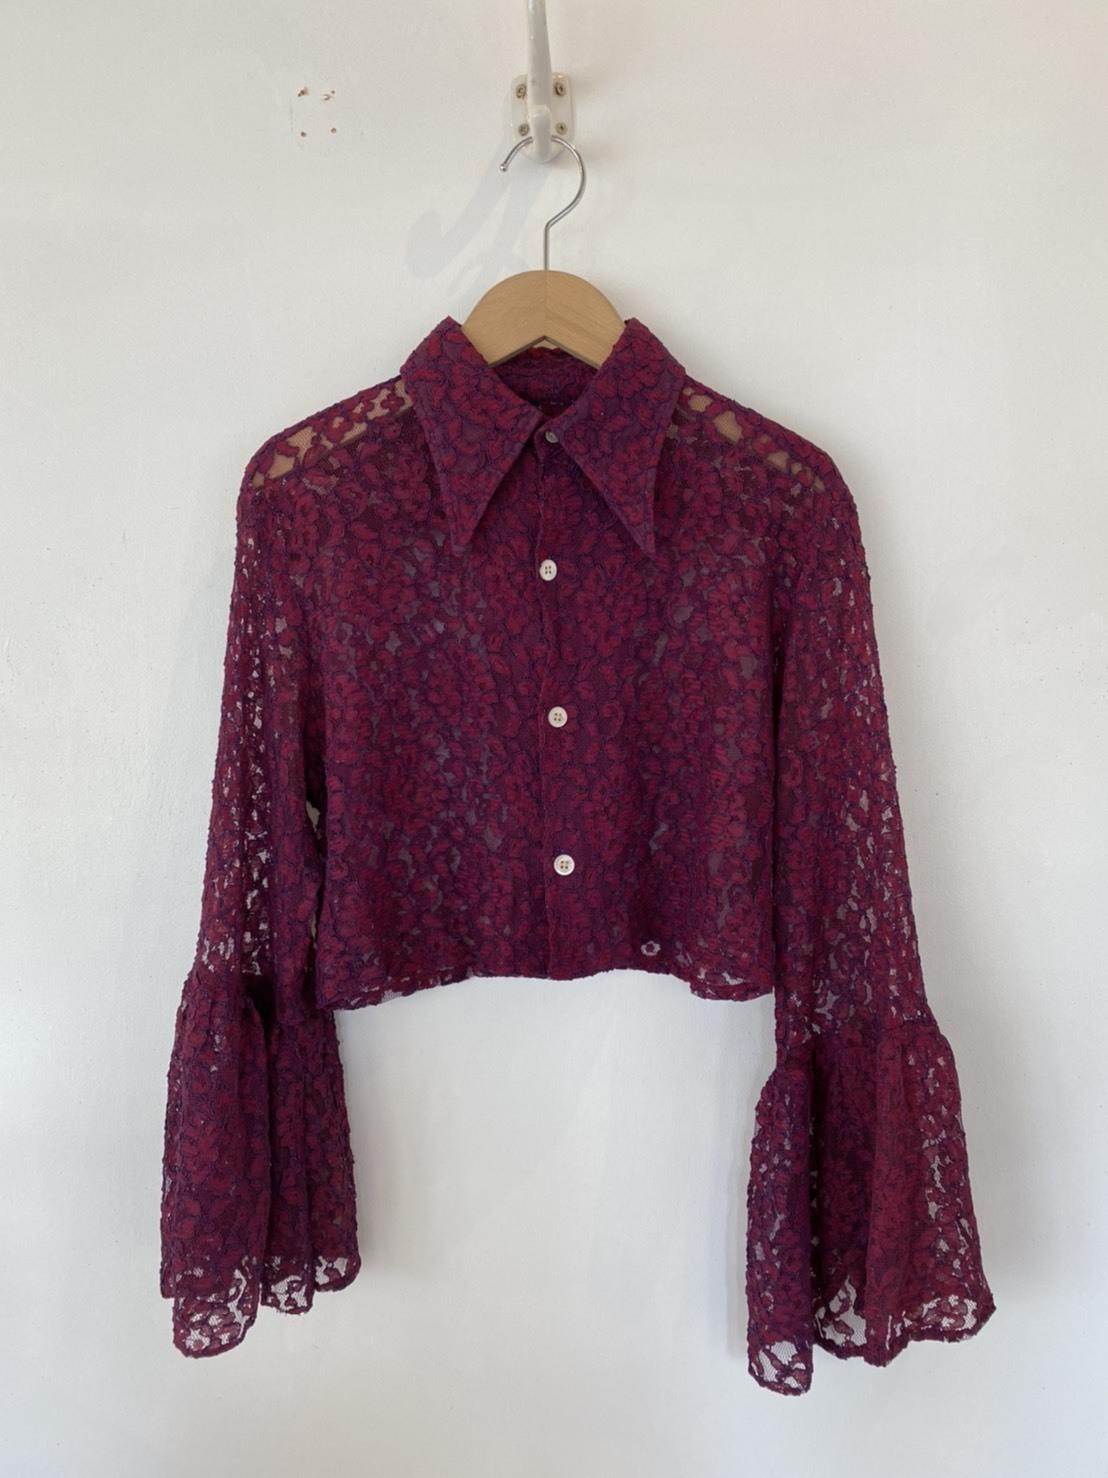 Remake blouse